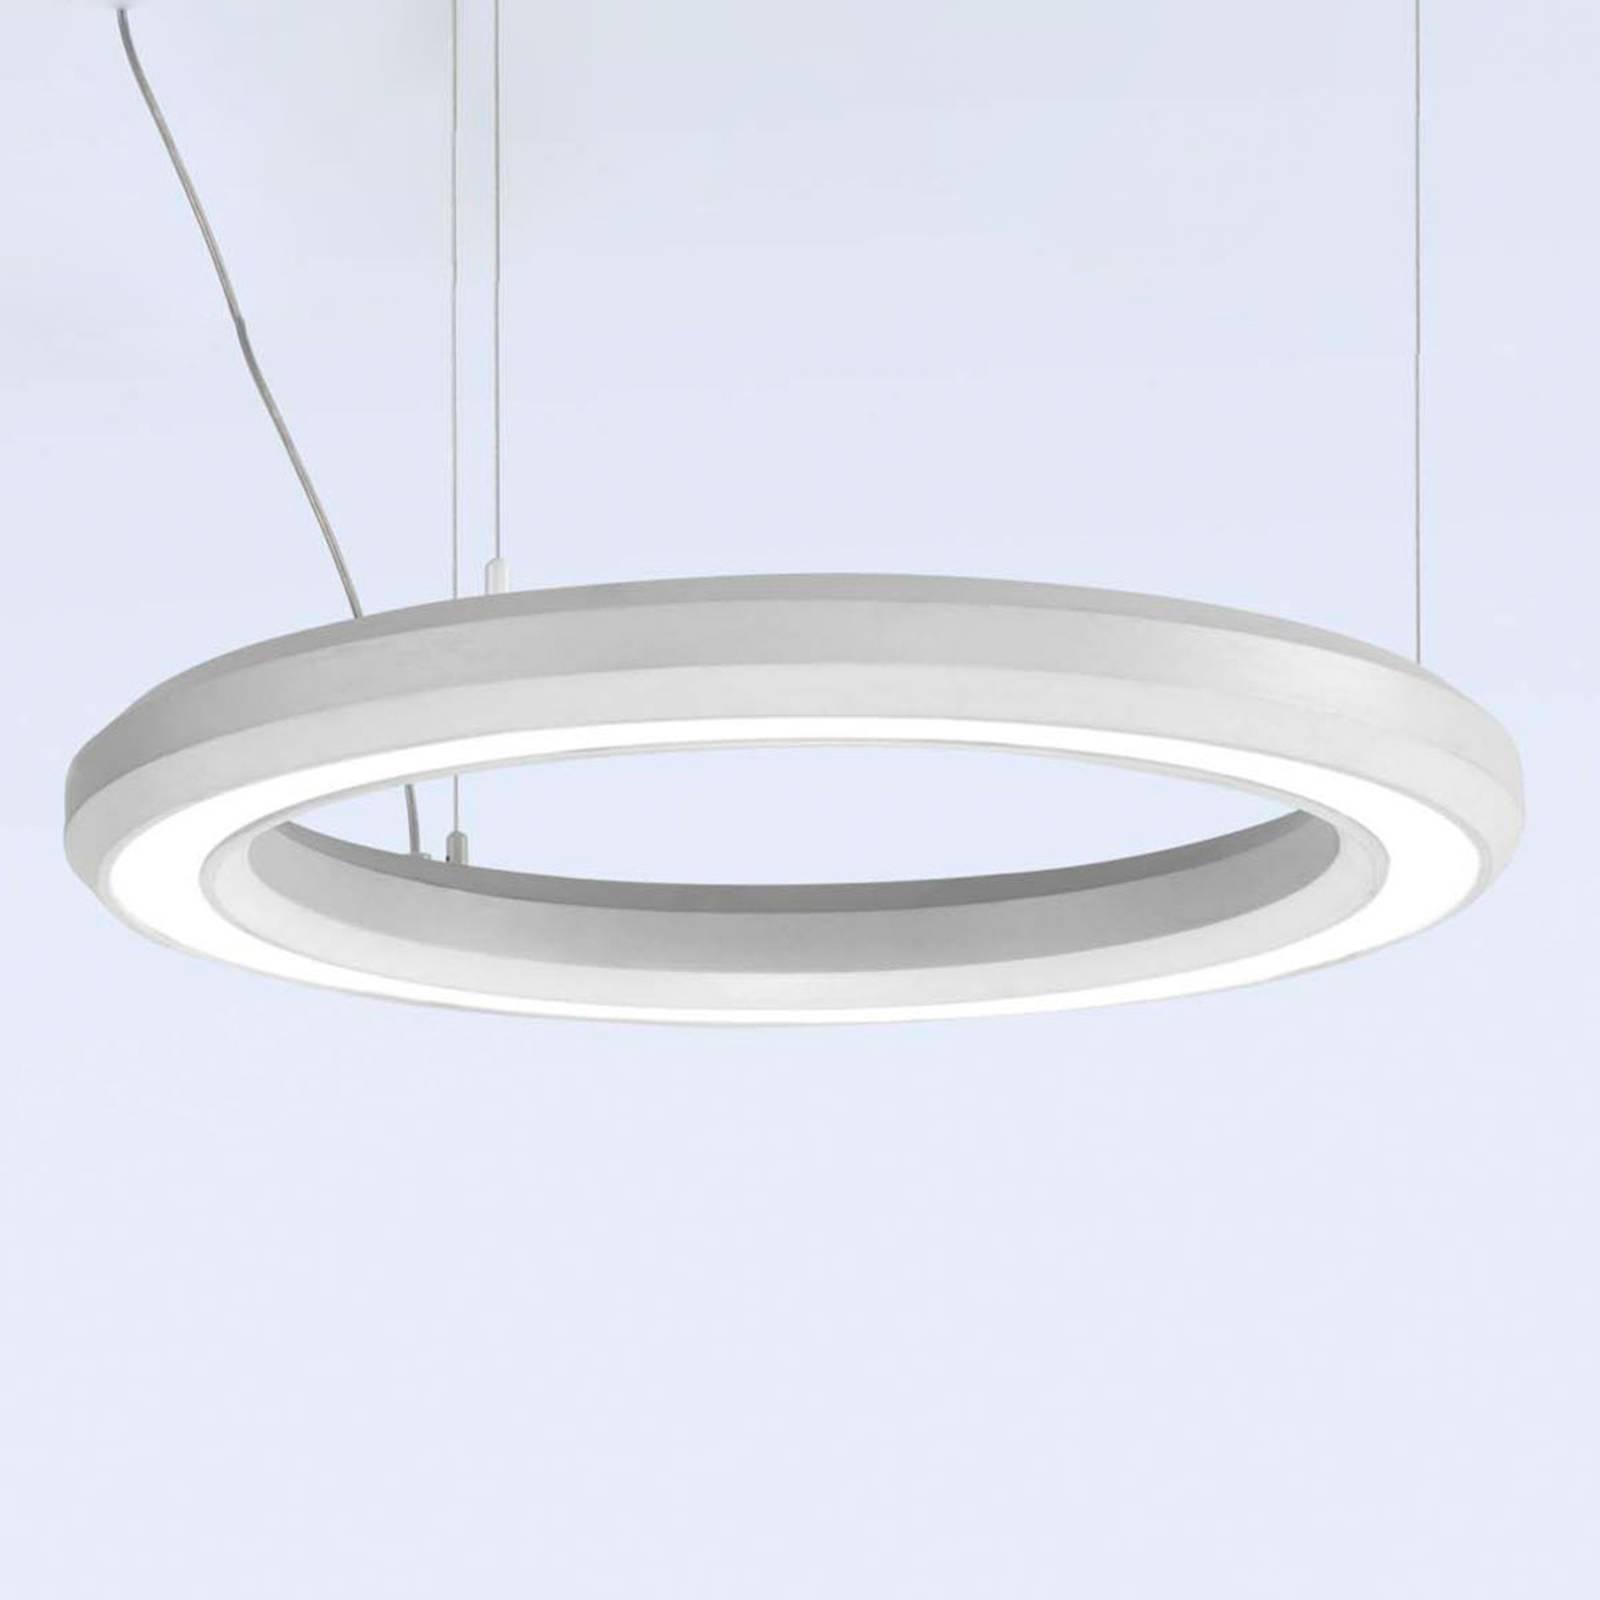 LED hanglamp Materica onder Ø 60 cm wit